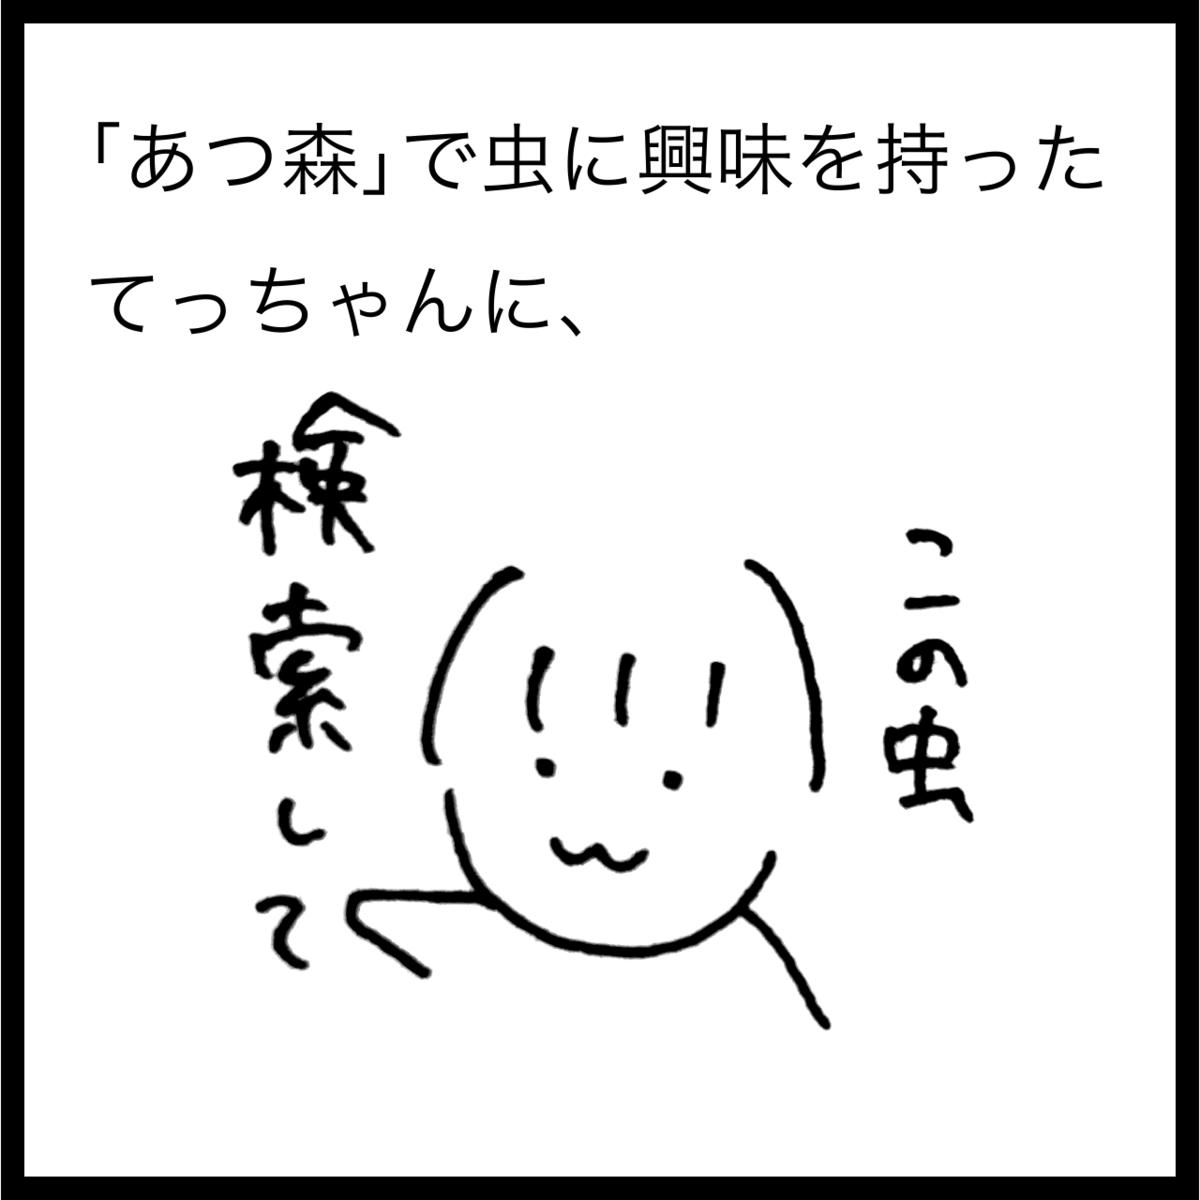 f:id:komyusyomama:20211012111330p:plain